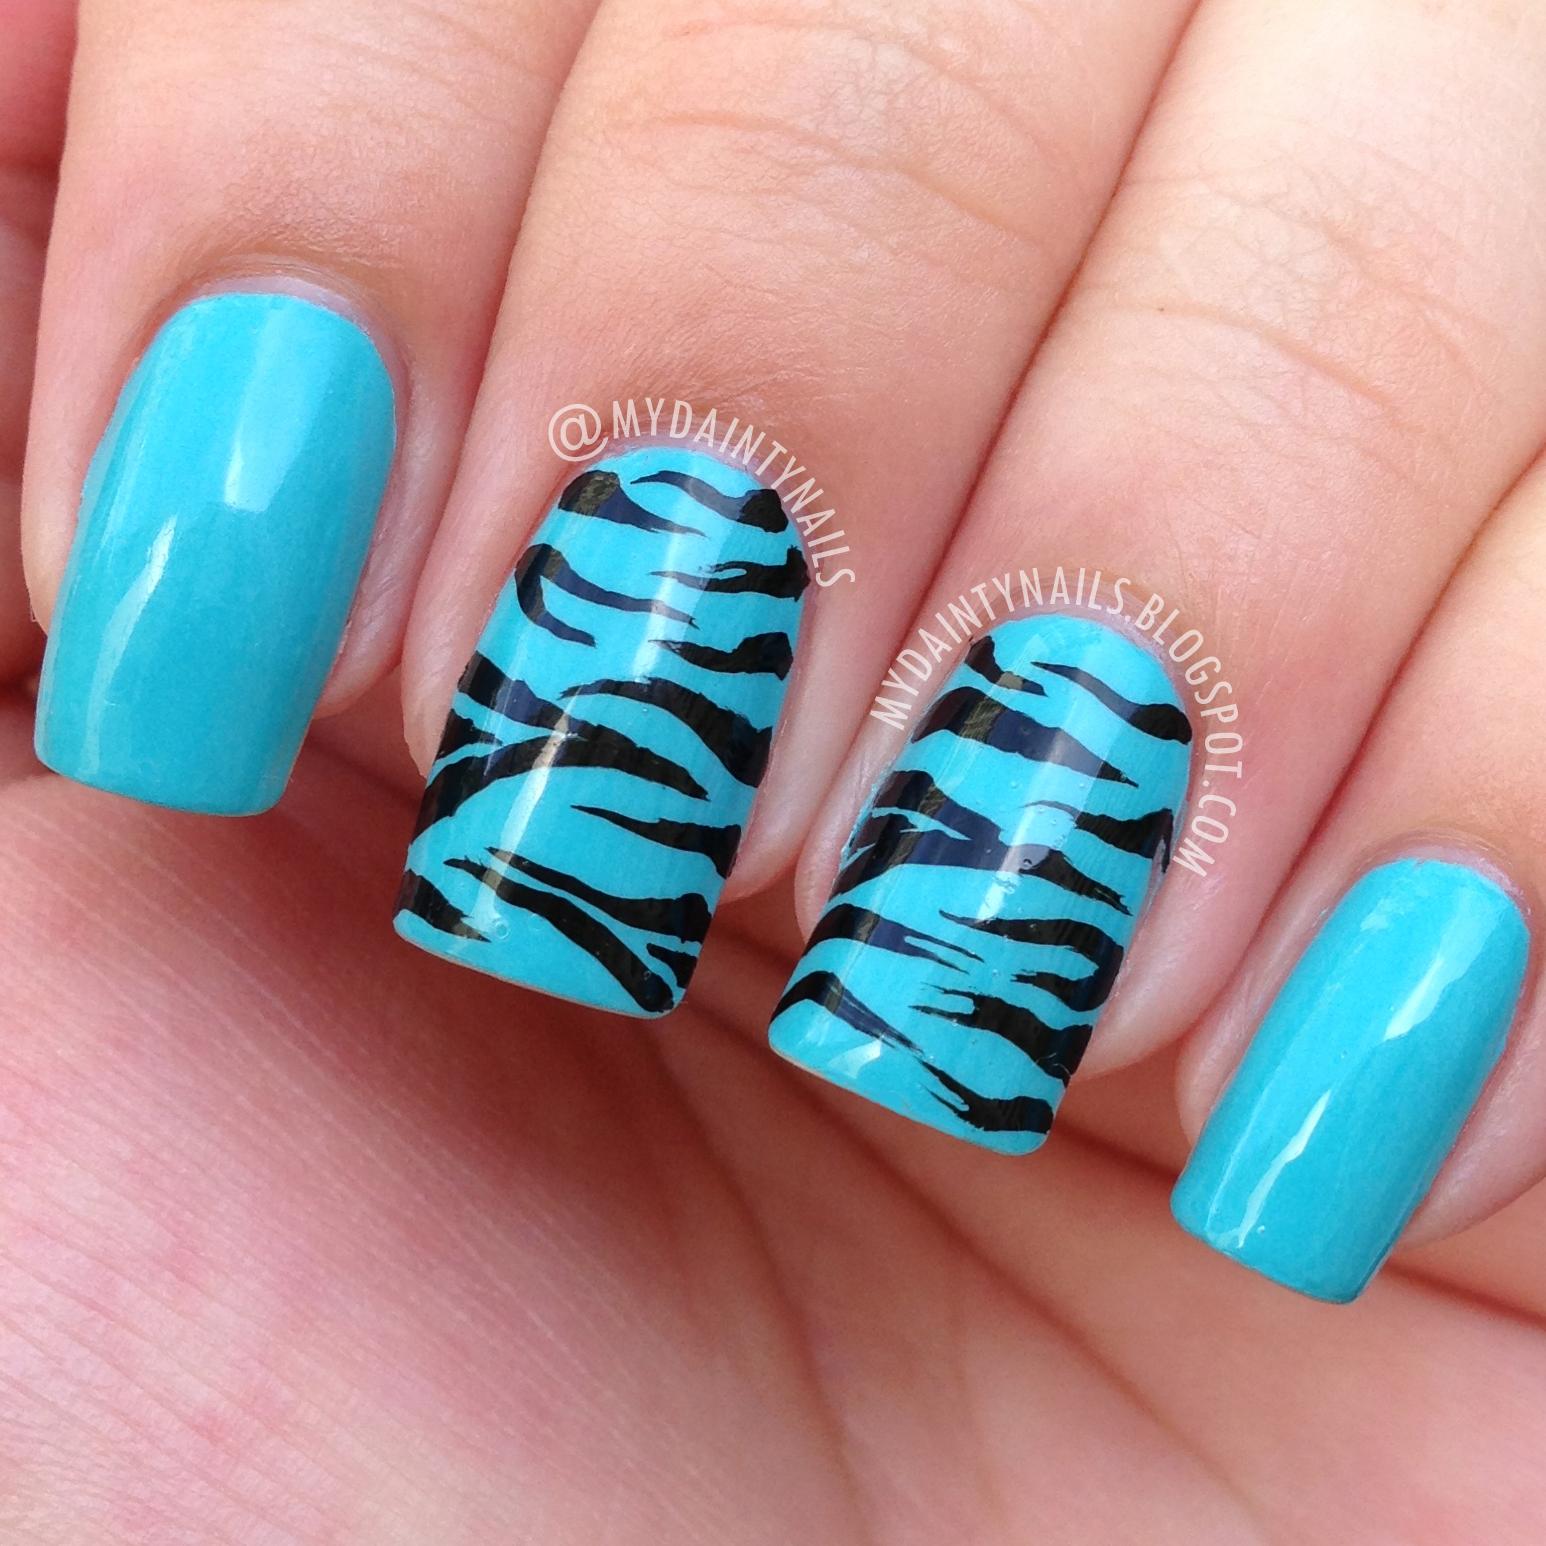 My Dainty Nails: Zebra Nails